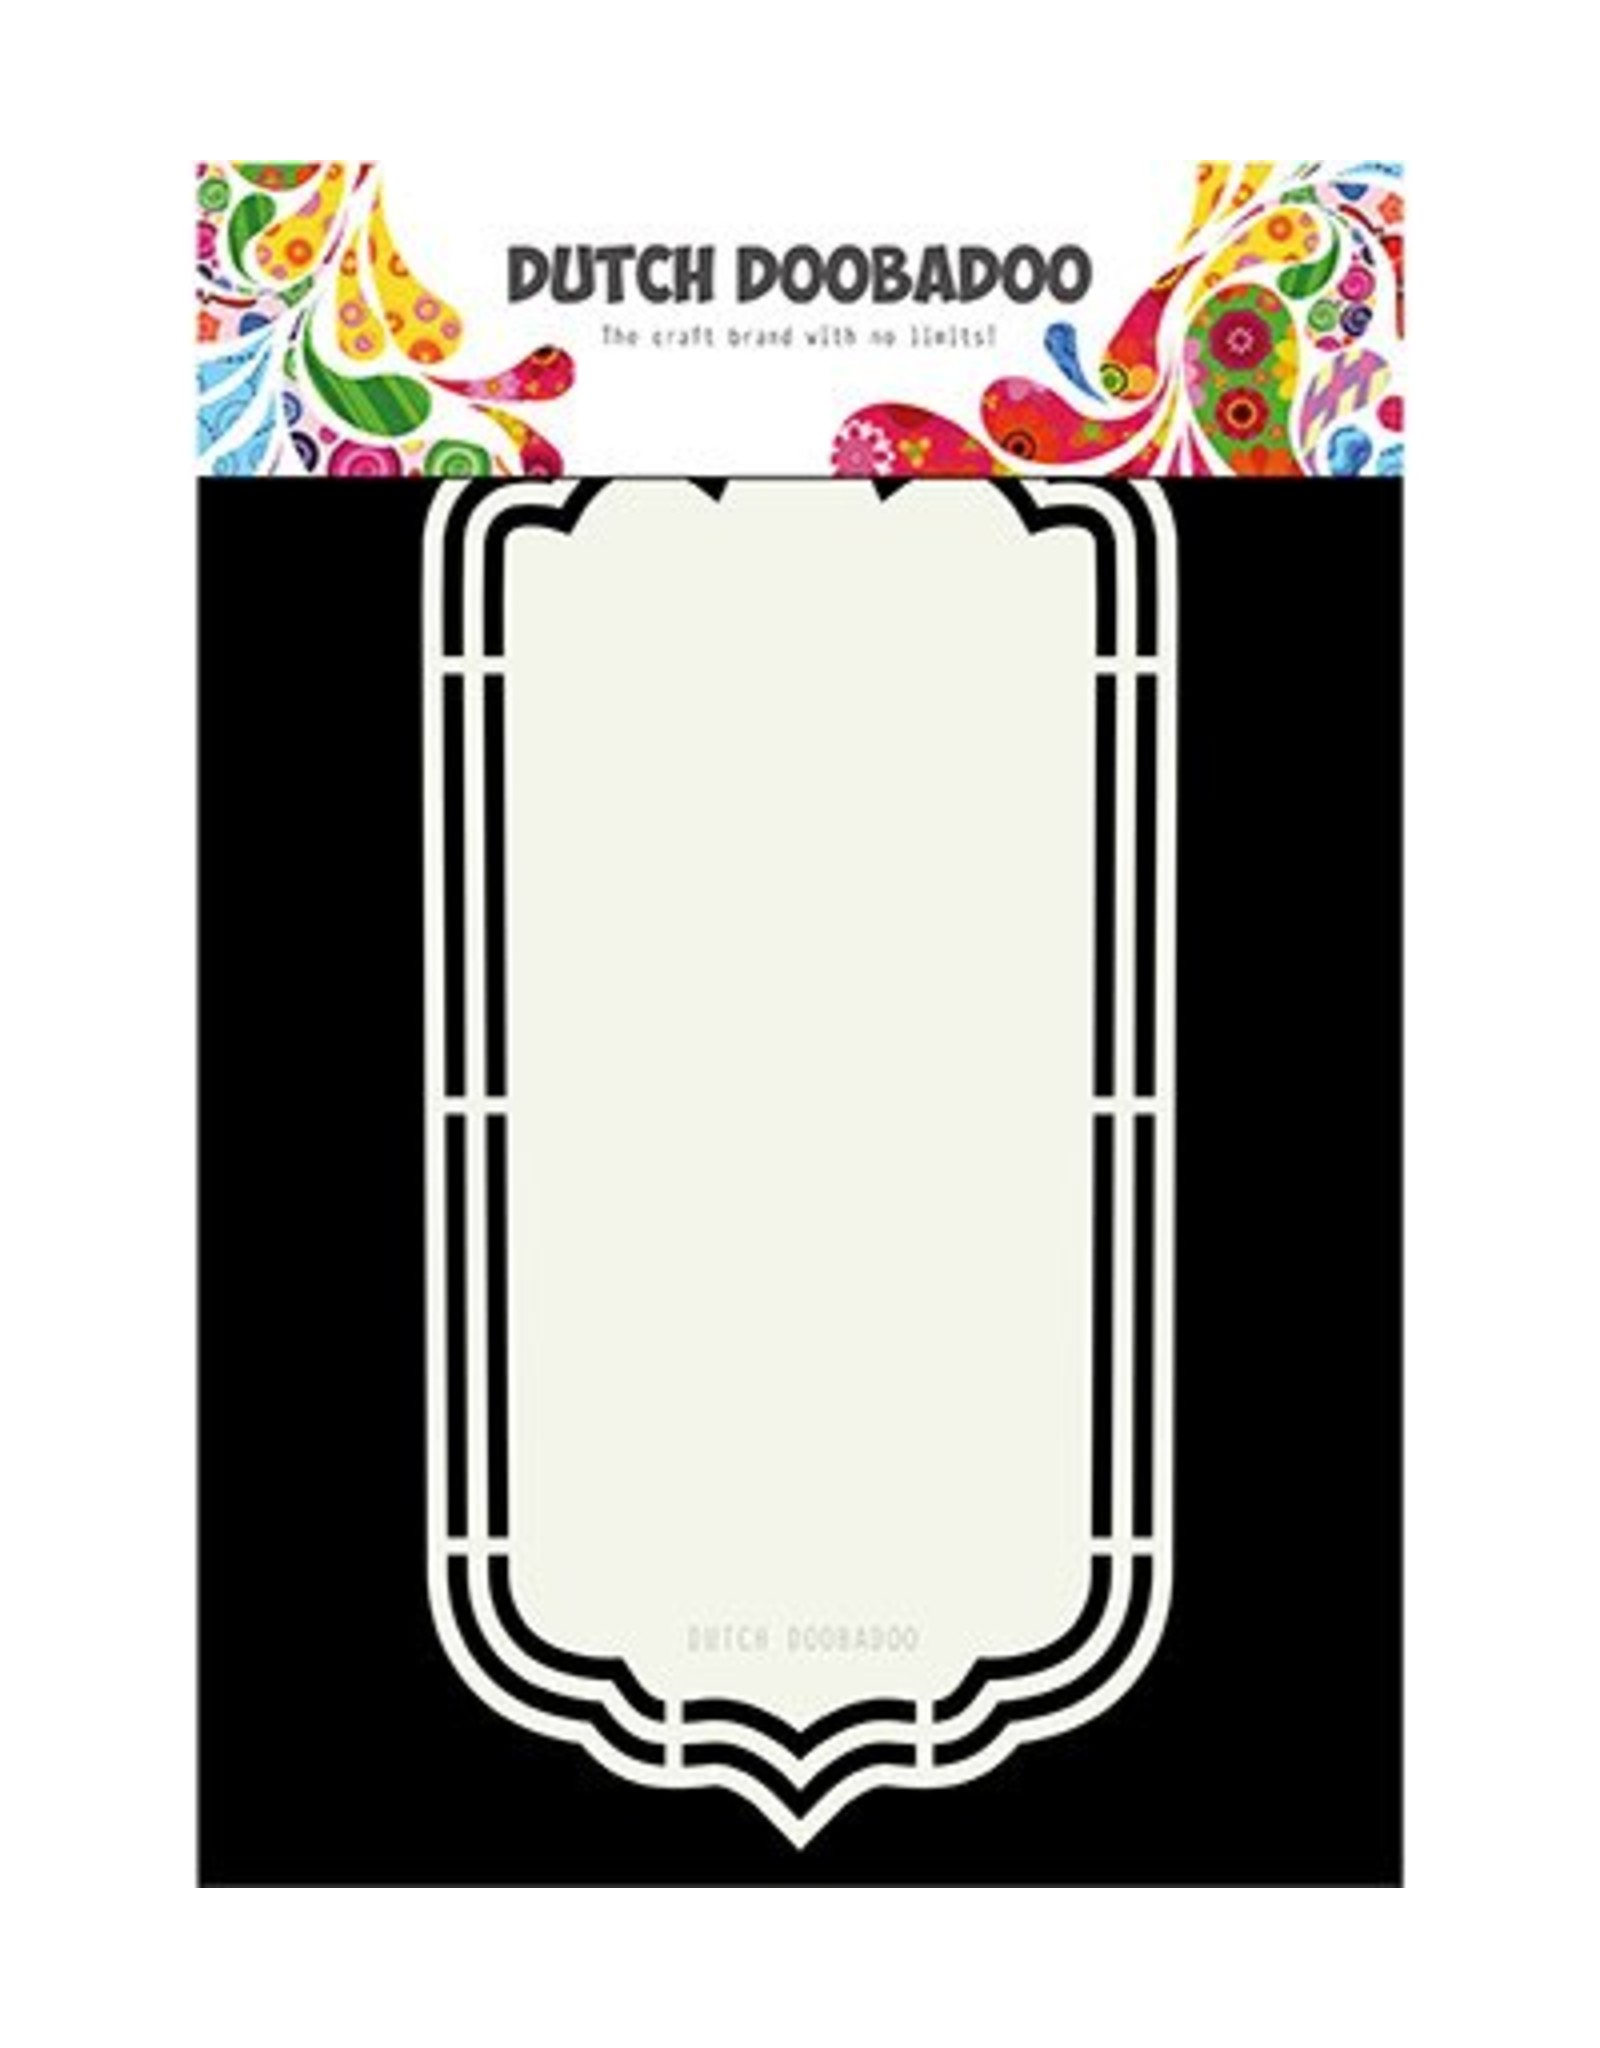 Dutch Doobadoo Shape Art Another label 470.713.168